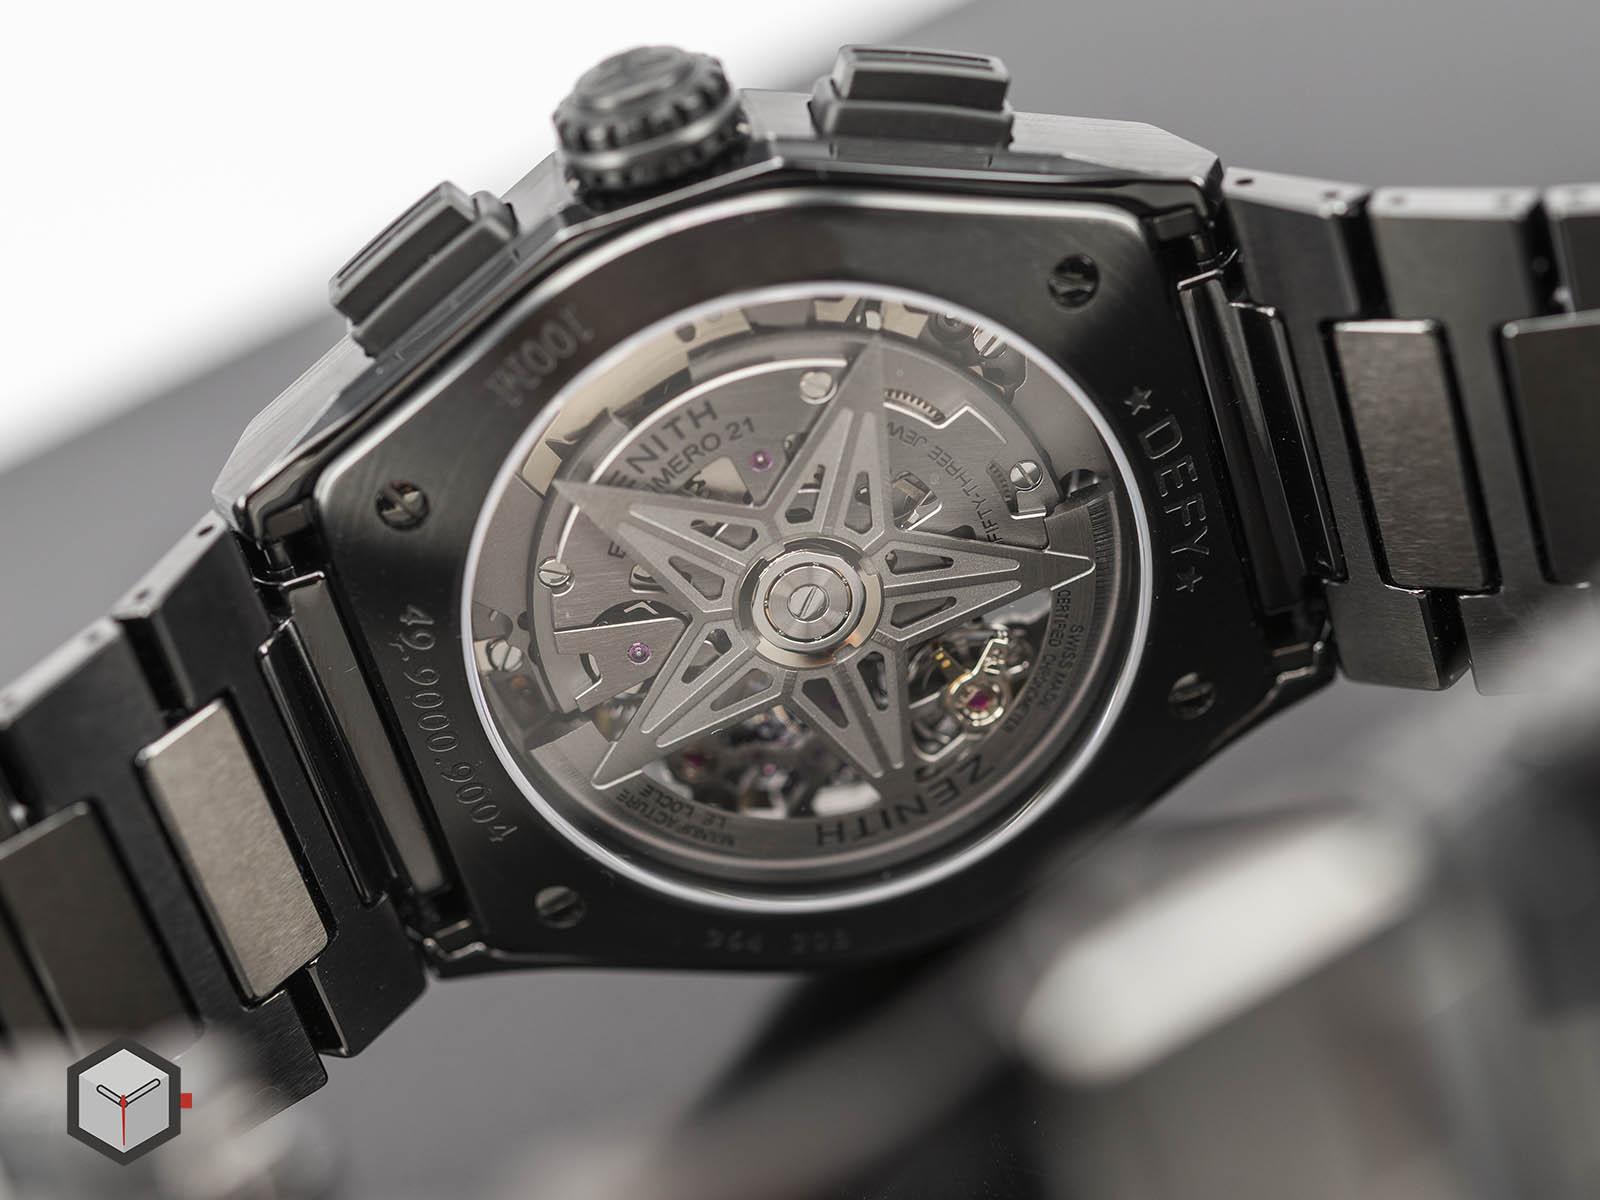 49-9000-9004-78-m9000-zenith-defy-el-primero-21-black-ceramic-9.jpg